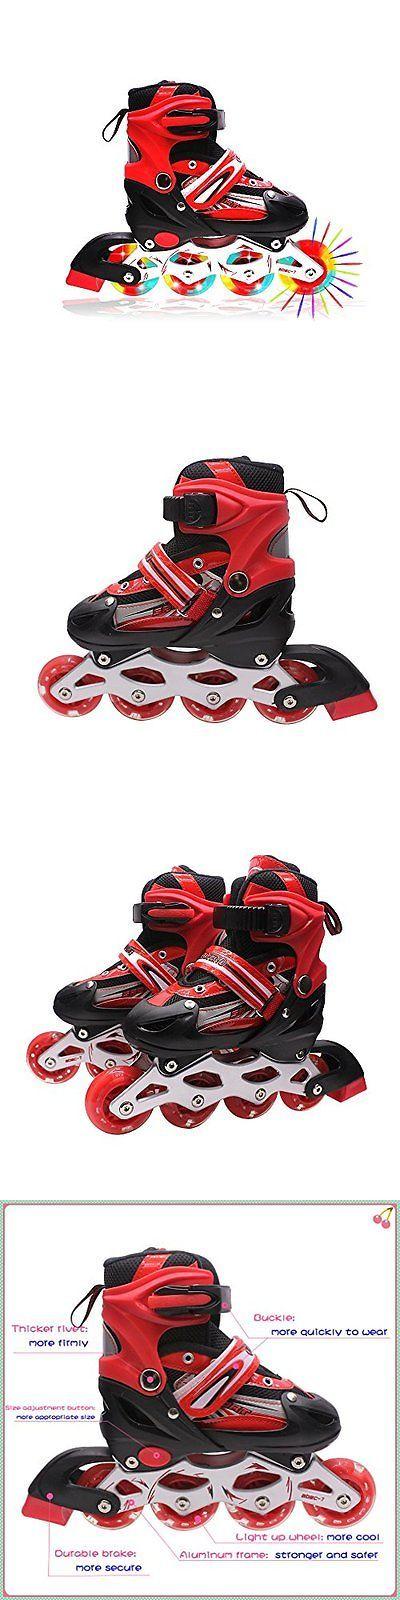 Youth 47345: Kids Light Up Inline Roller Skates Adjustable Rollerblades Unisex Red M -> BUY IT NOW ONLY: $73.95 on eBay!